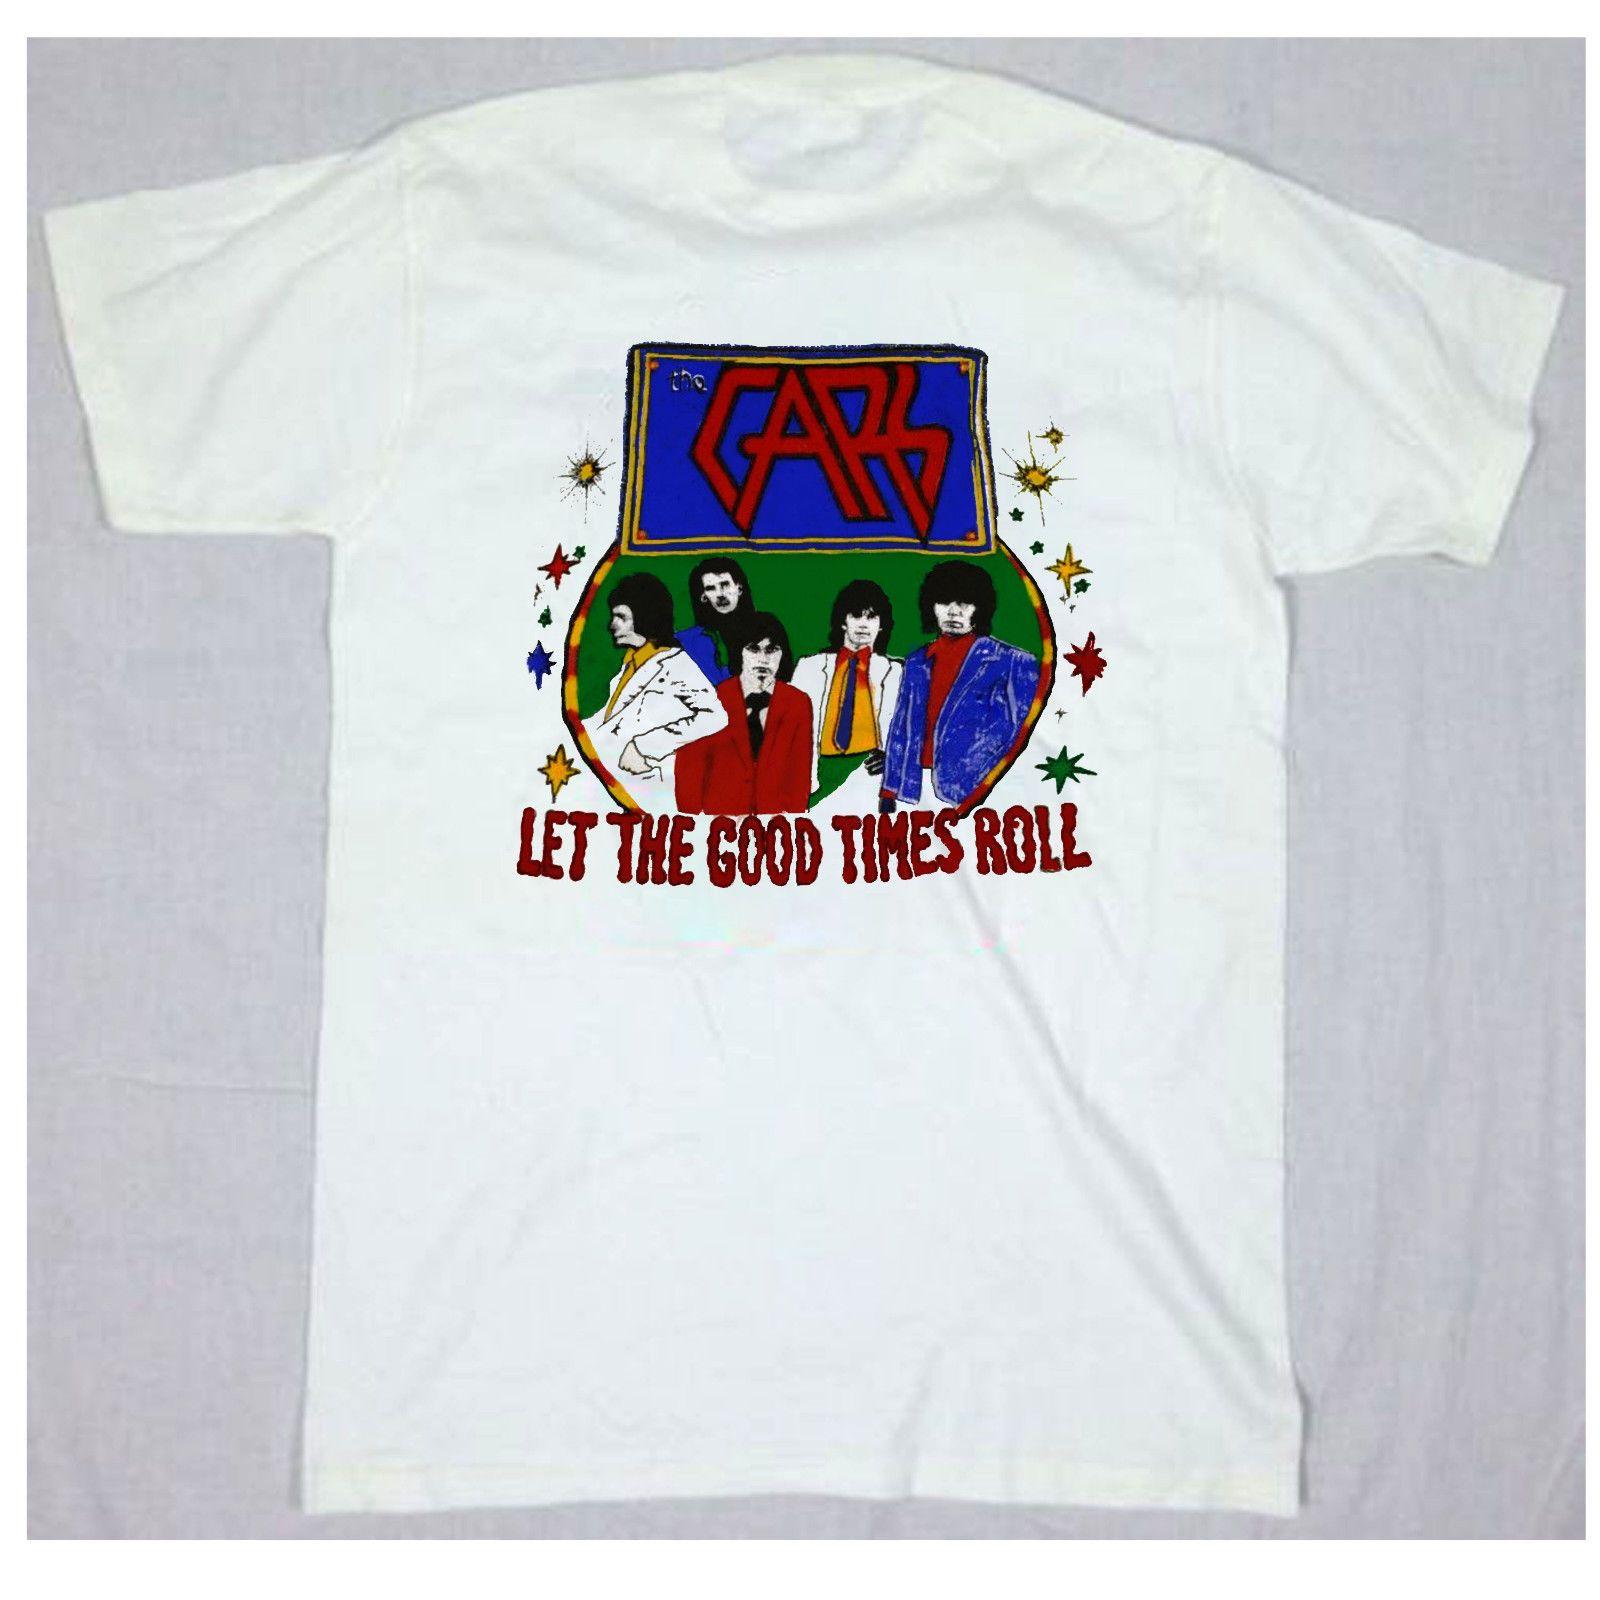 Vintage 80s concert t shirts think